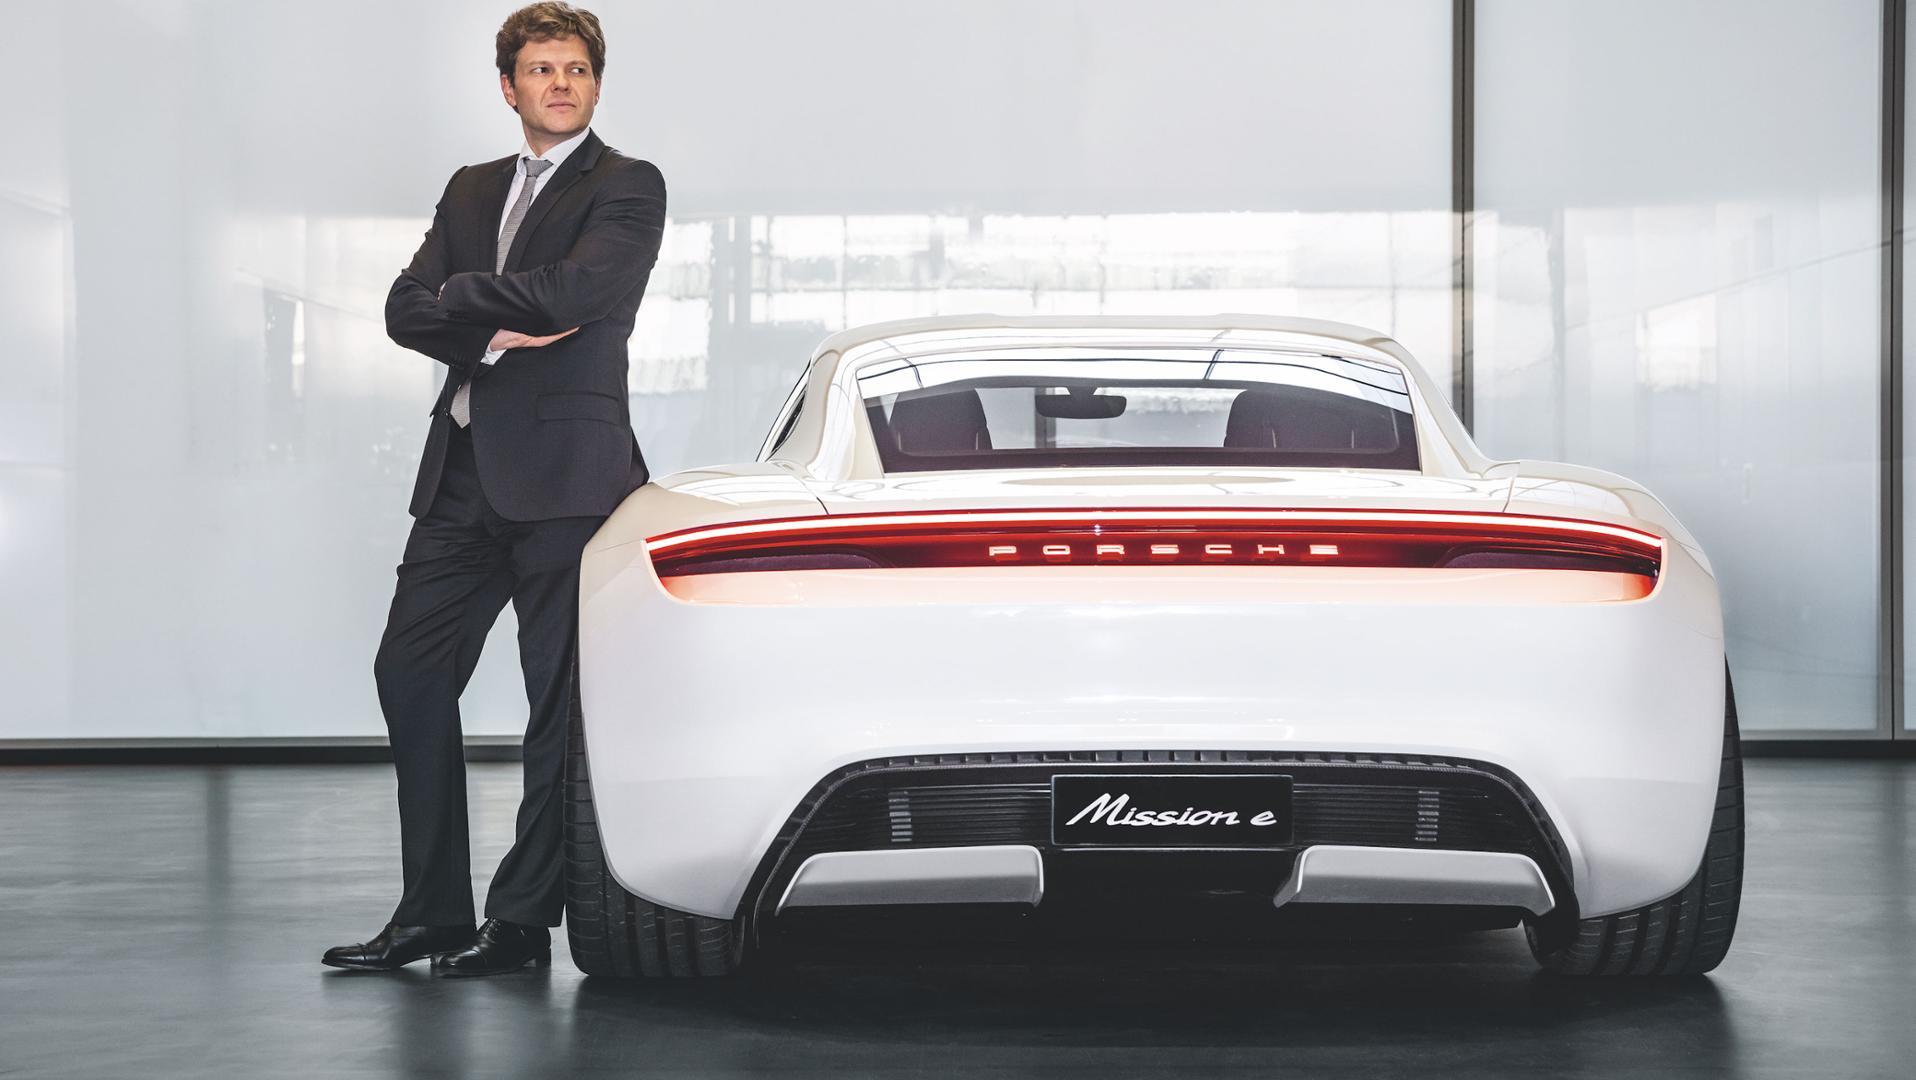 Do You Like Driving A Luxury Car